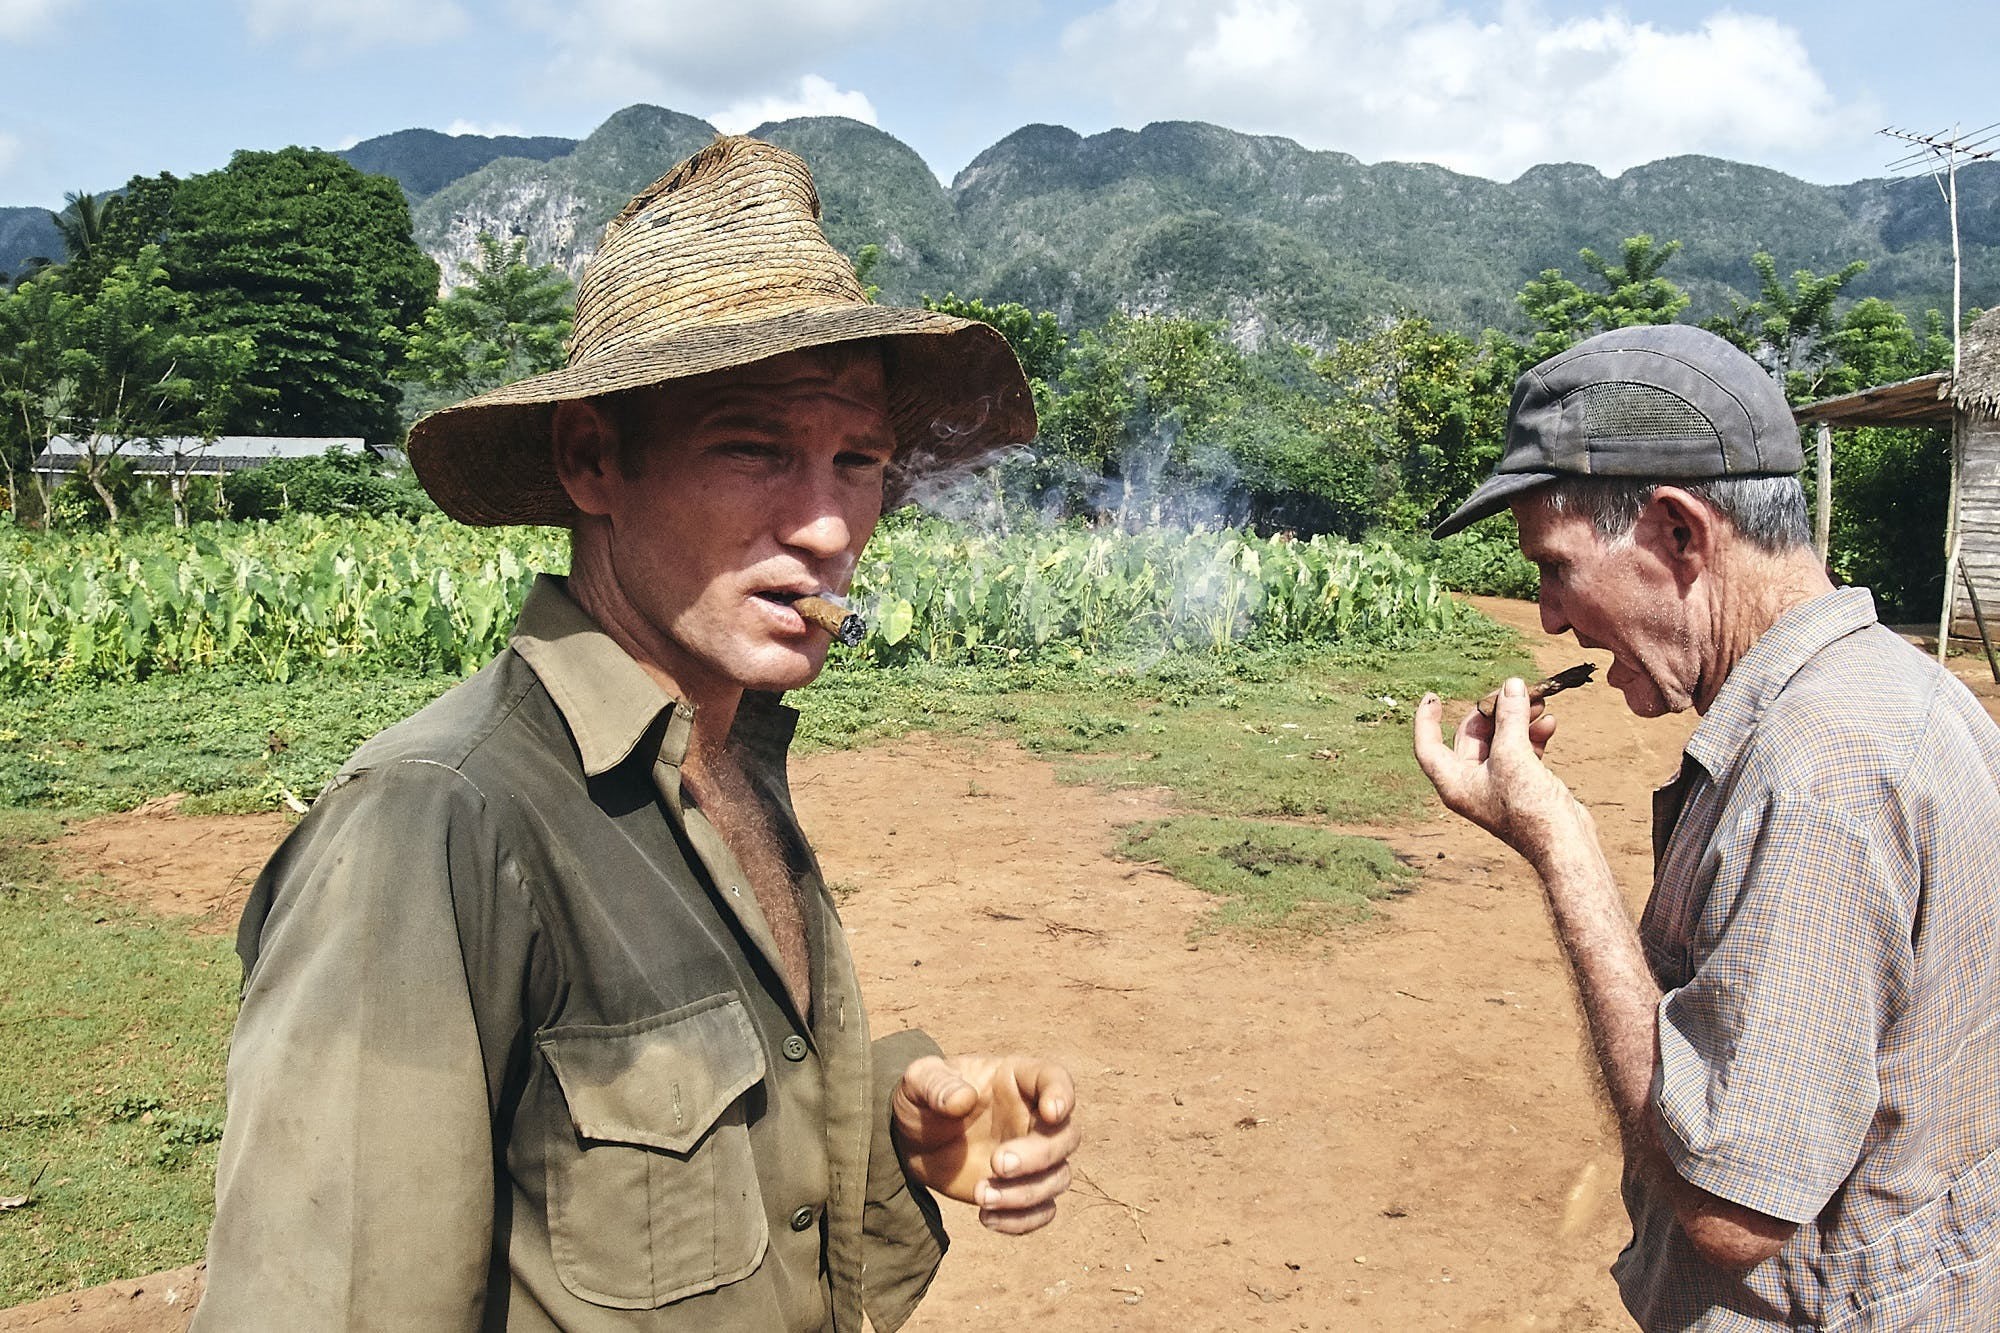 Cuban cigar makers sampling their product.